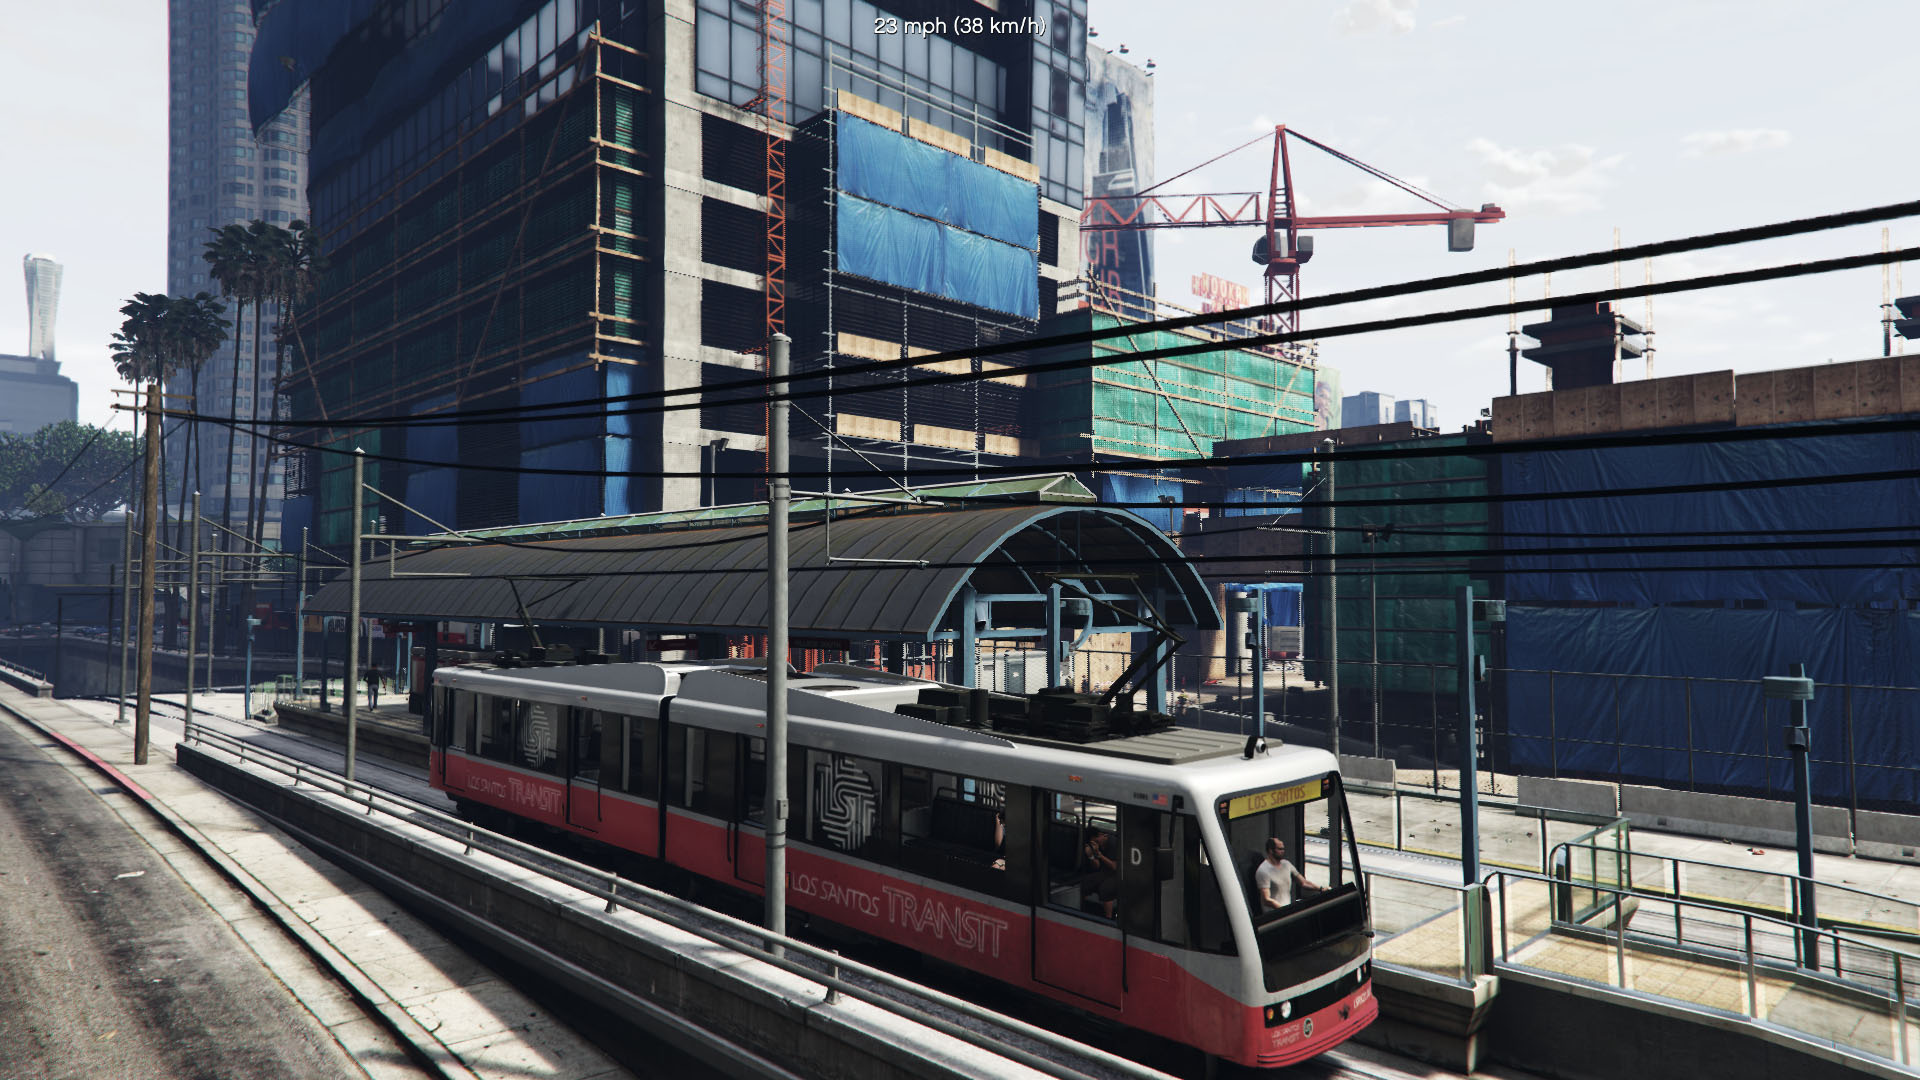 Railroad Engineer (train mod with derailment) - GTA5-Mods com